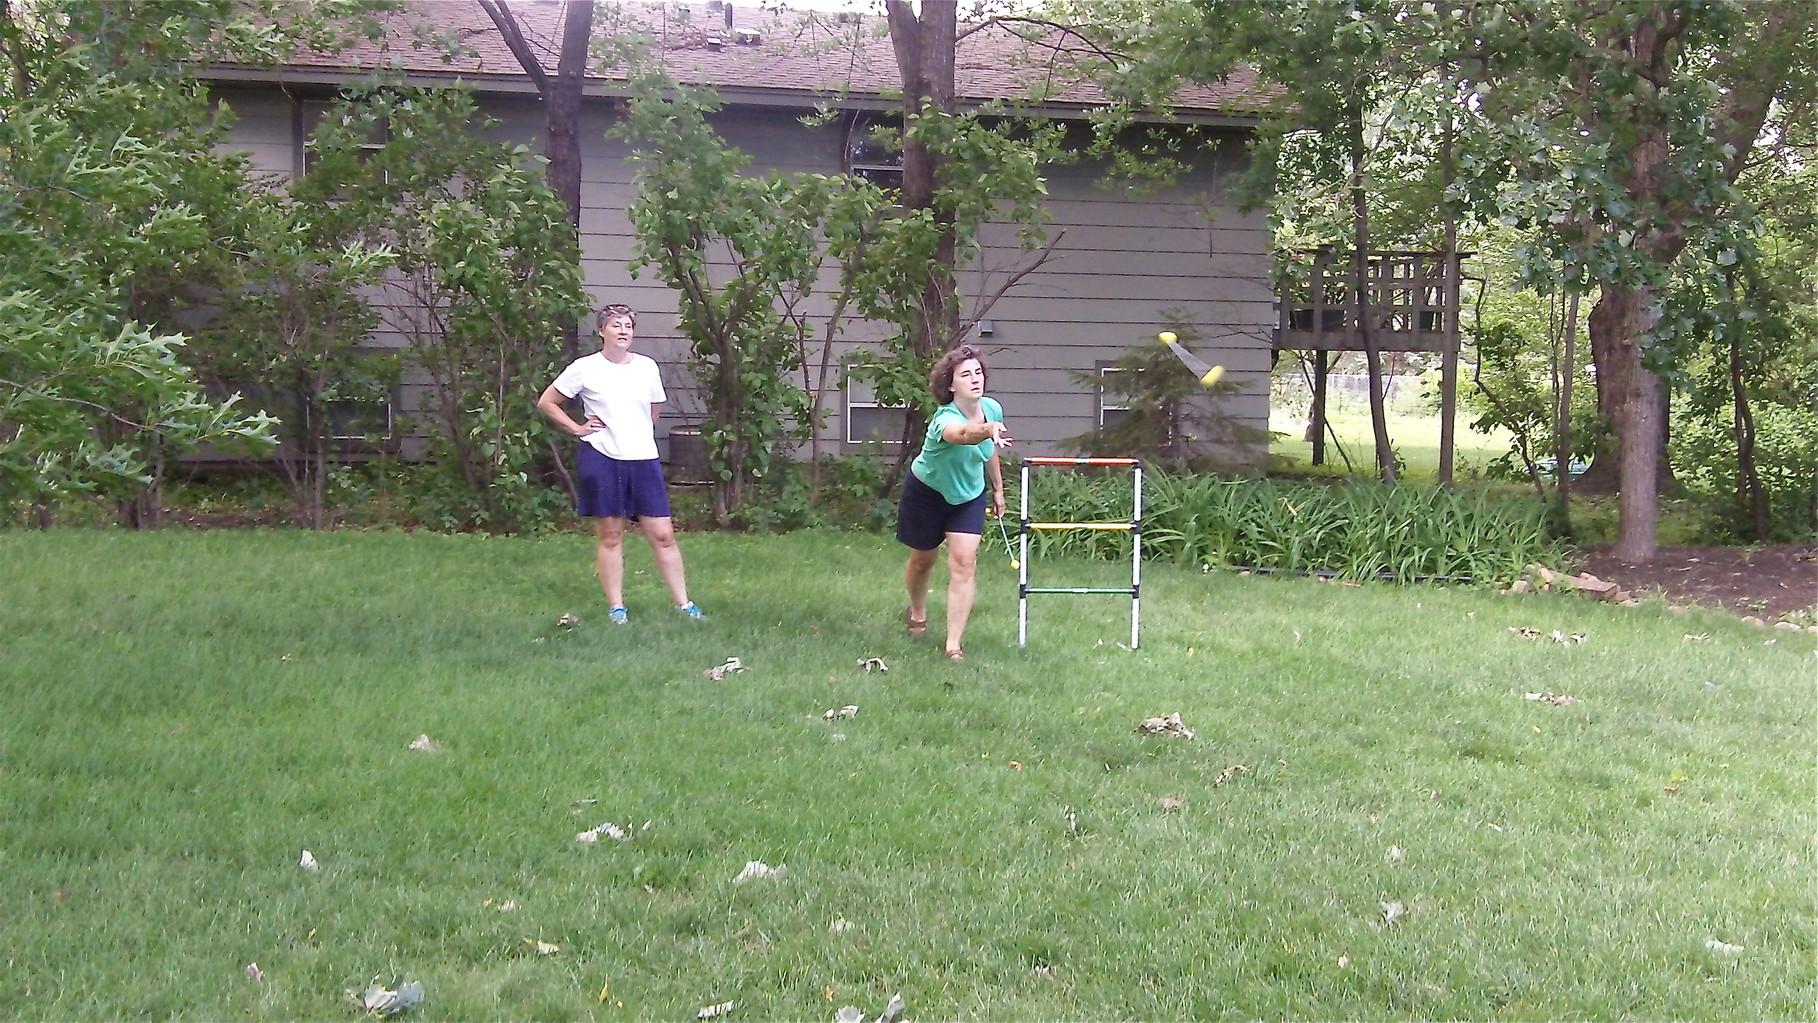 Cindy looks on as Ann throws